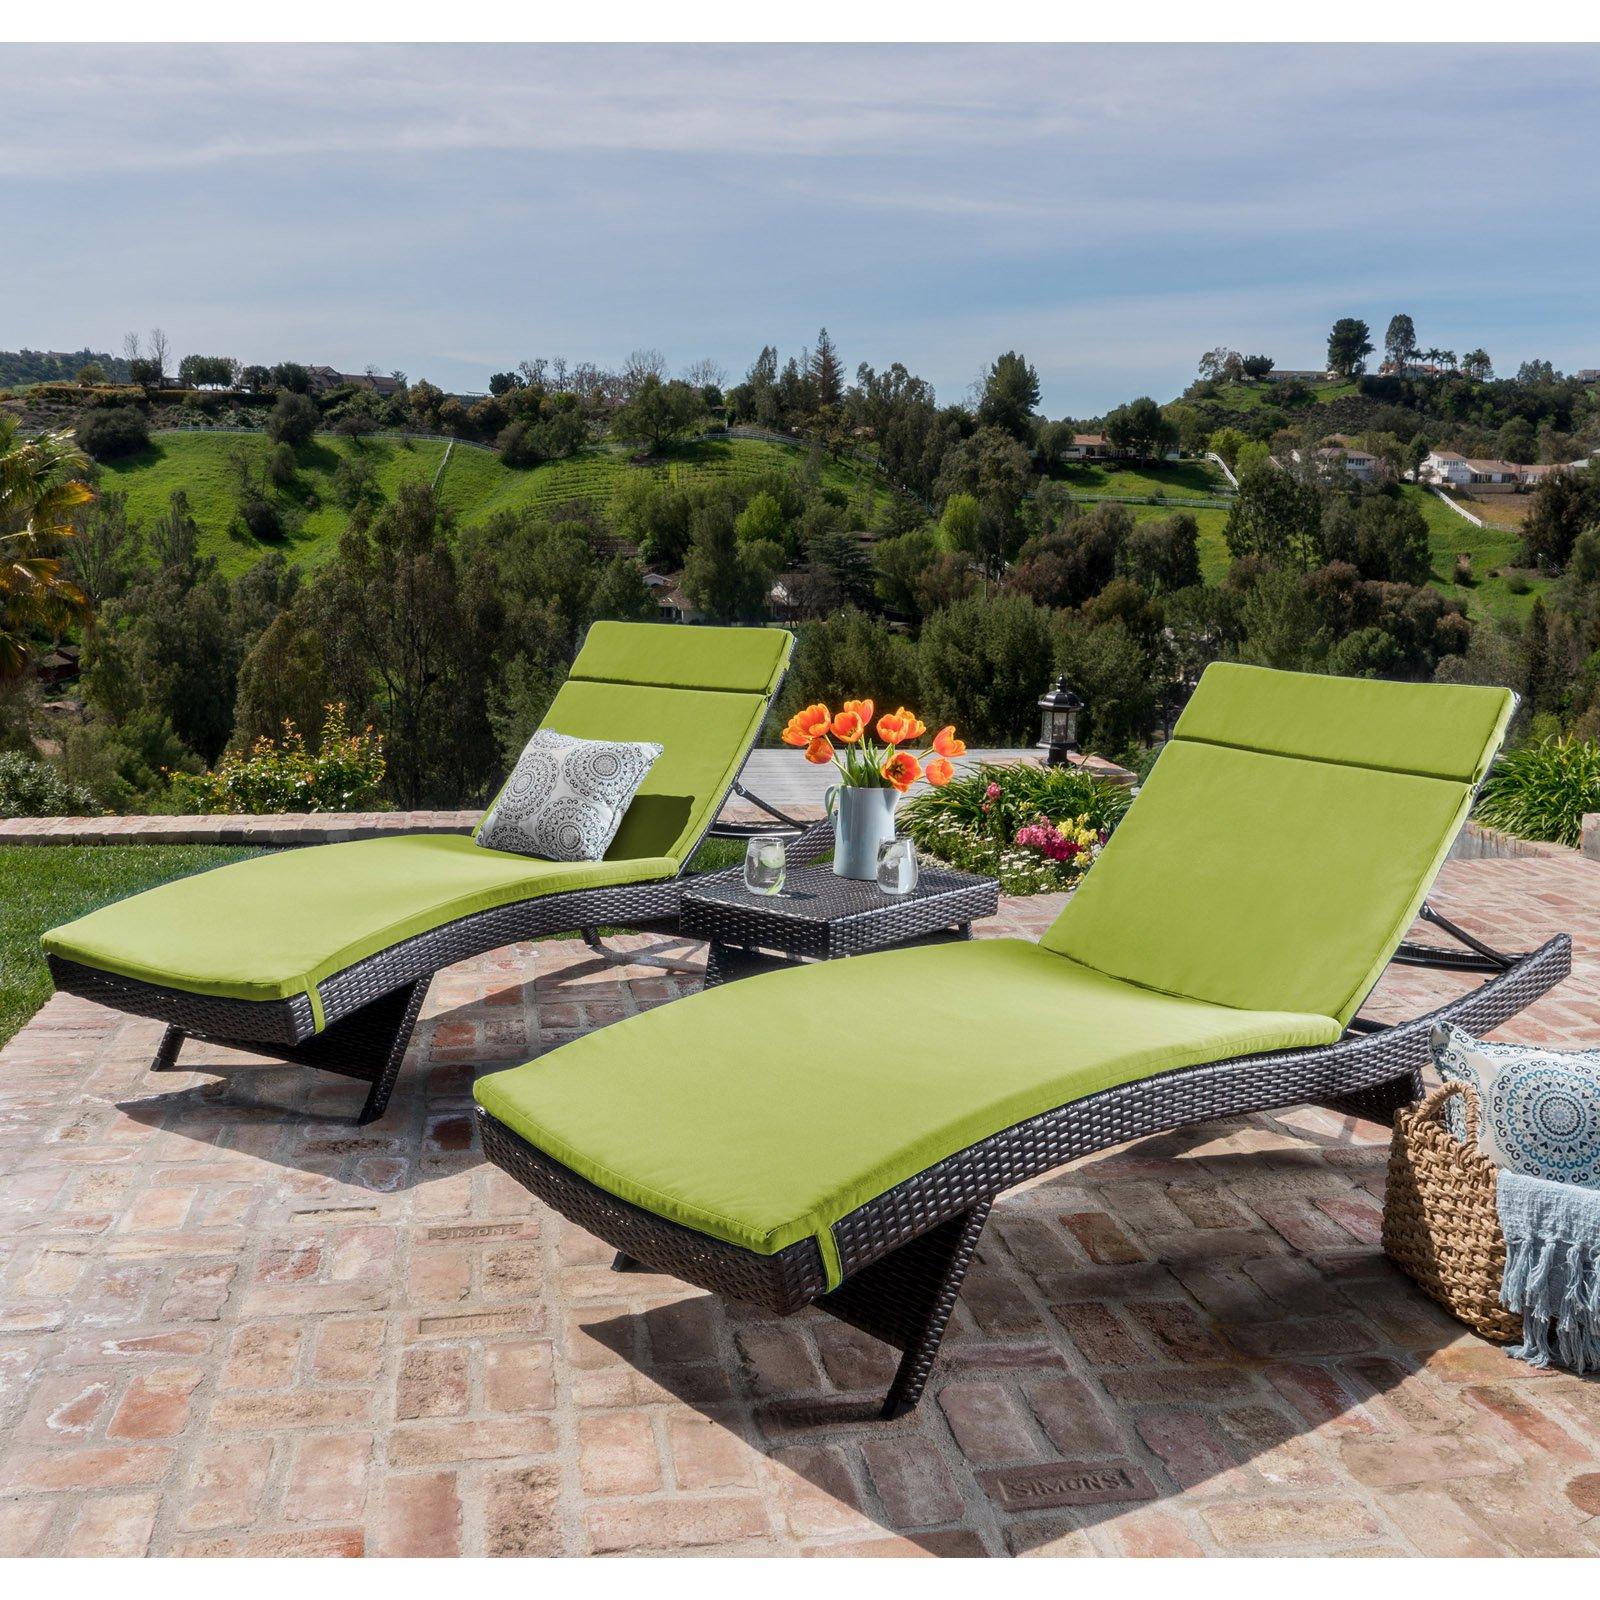 Halulu Wicker 3 Piece Chaise Lounge Set with Cushion by GDF Studio